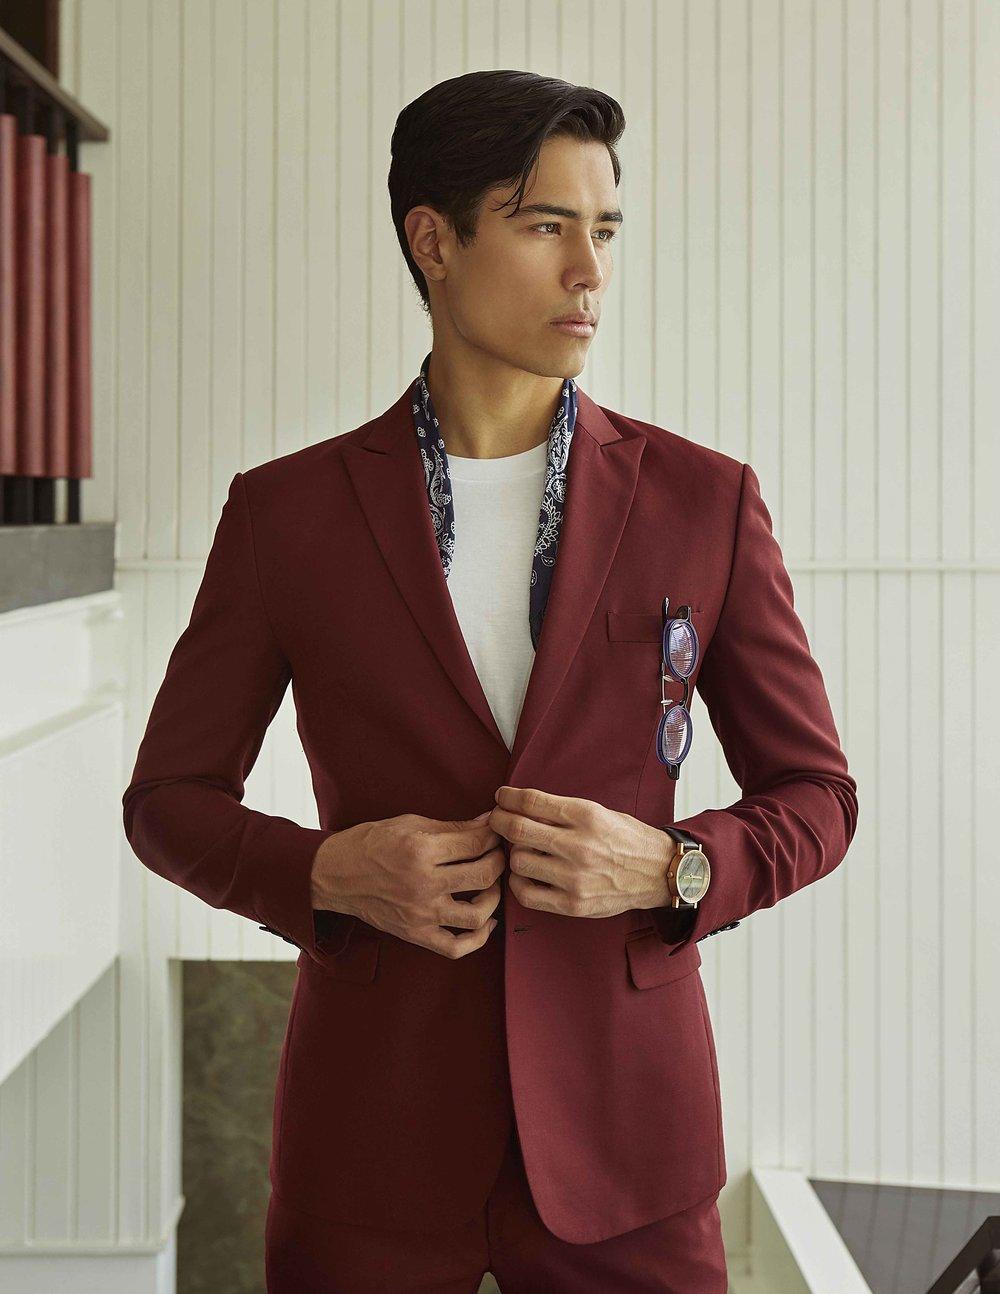 suit : CV_HOMME / t-shirt : JOCKEY / eyeglasses : TAVAT / watch : FORREST